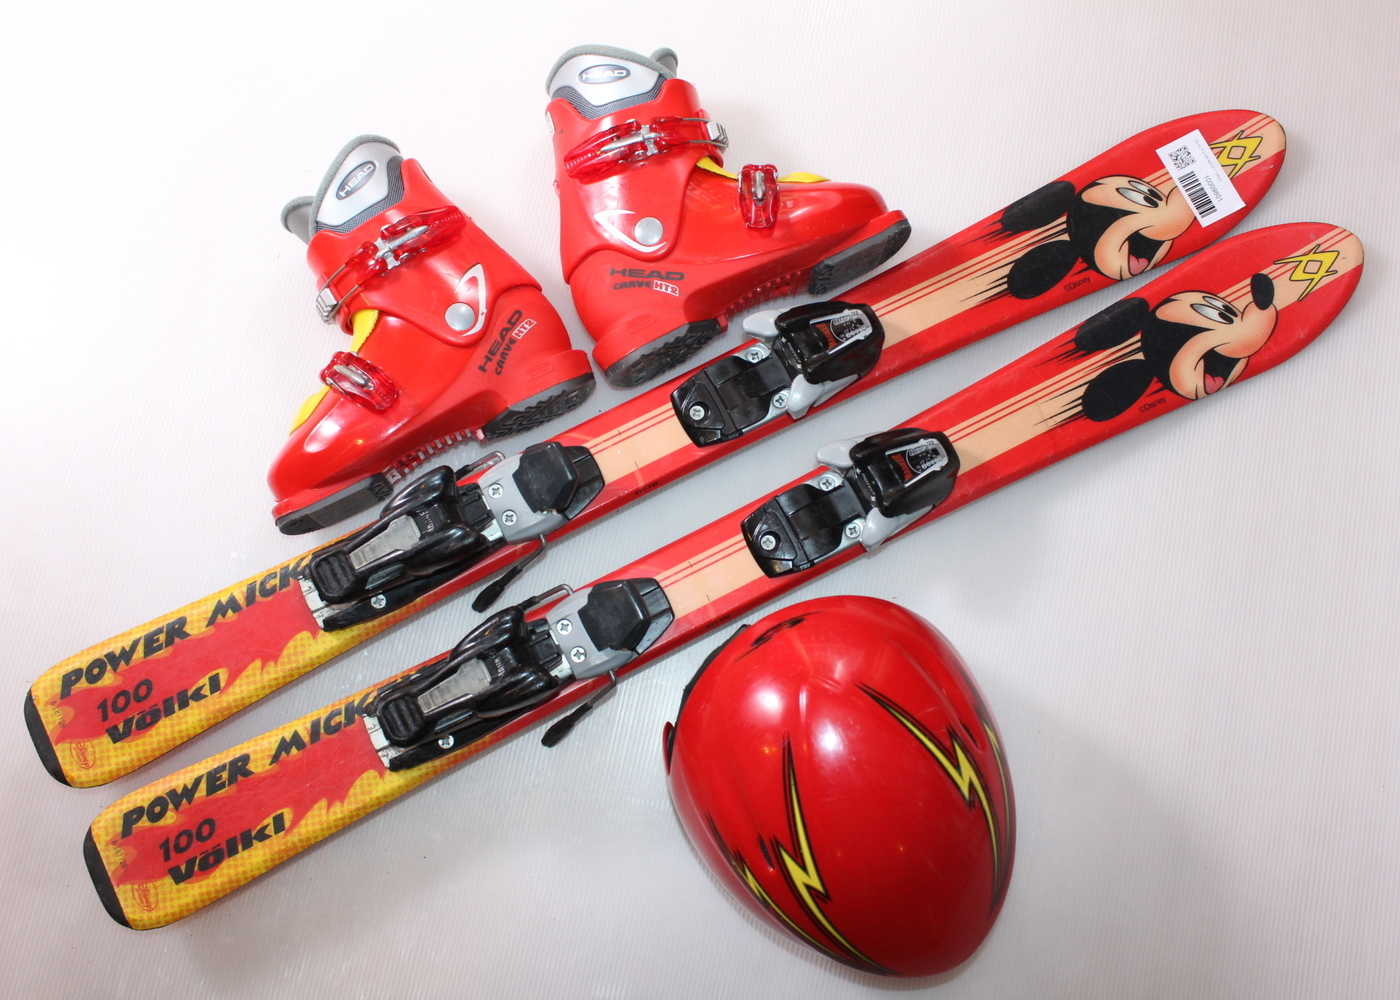 Dětské lyže VOLKL FOVER MICKEY 100 cm + lyžáky  32EU + helma